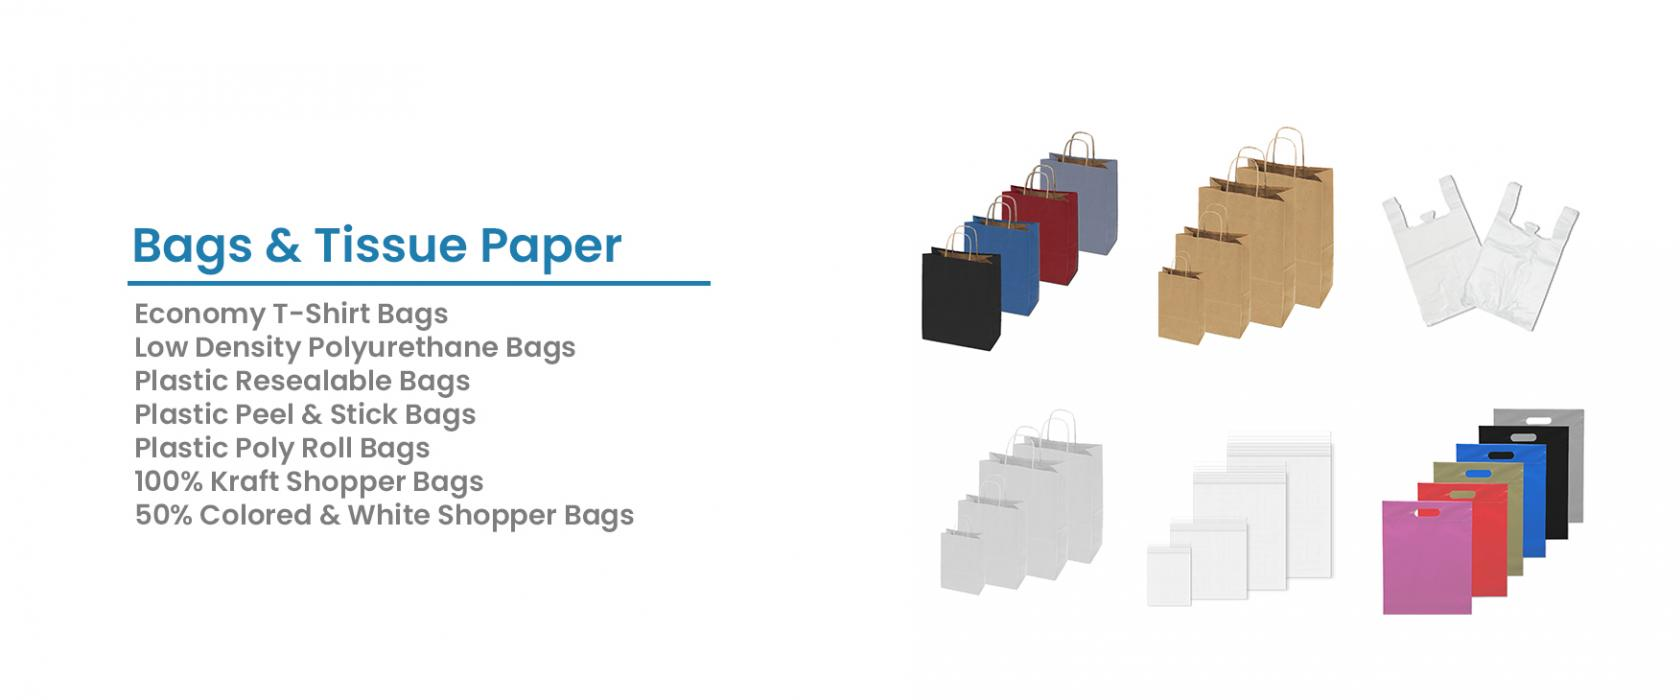 Bags & Tissue Paper